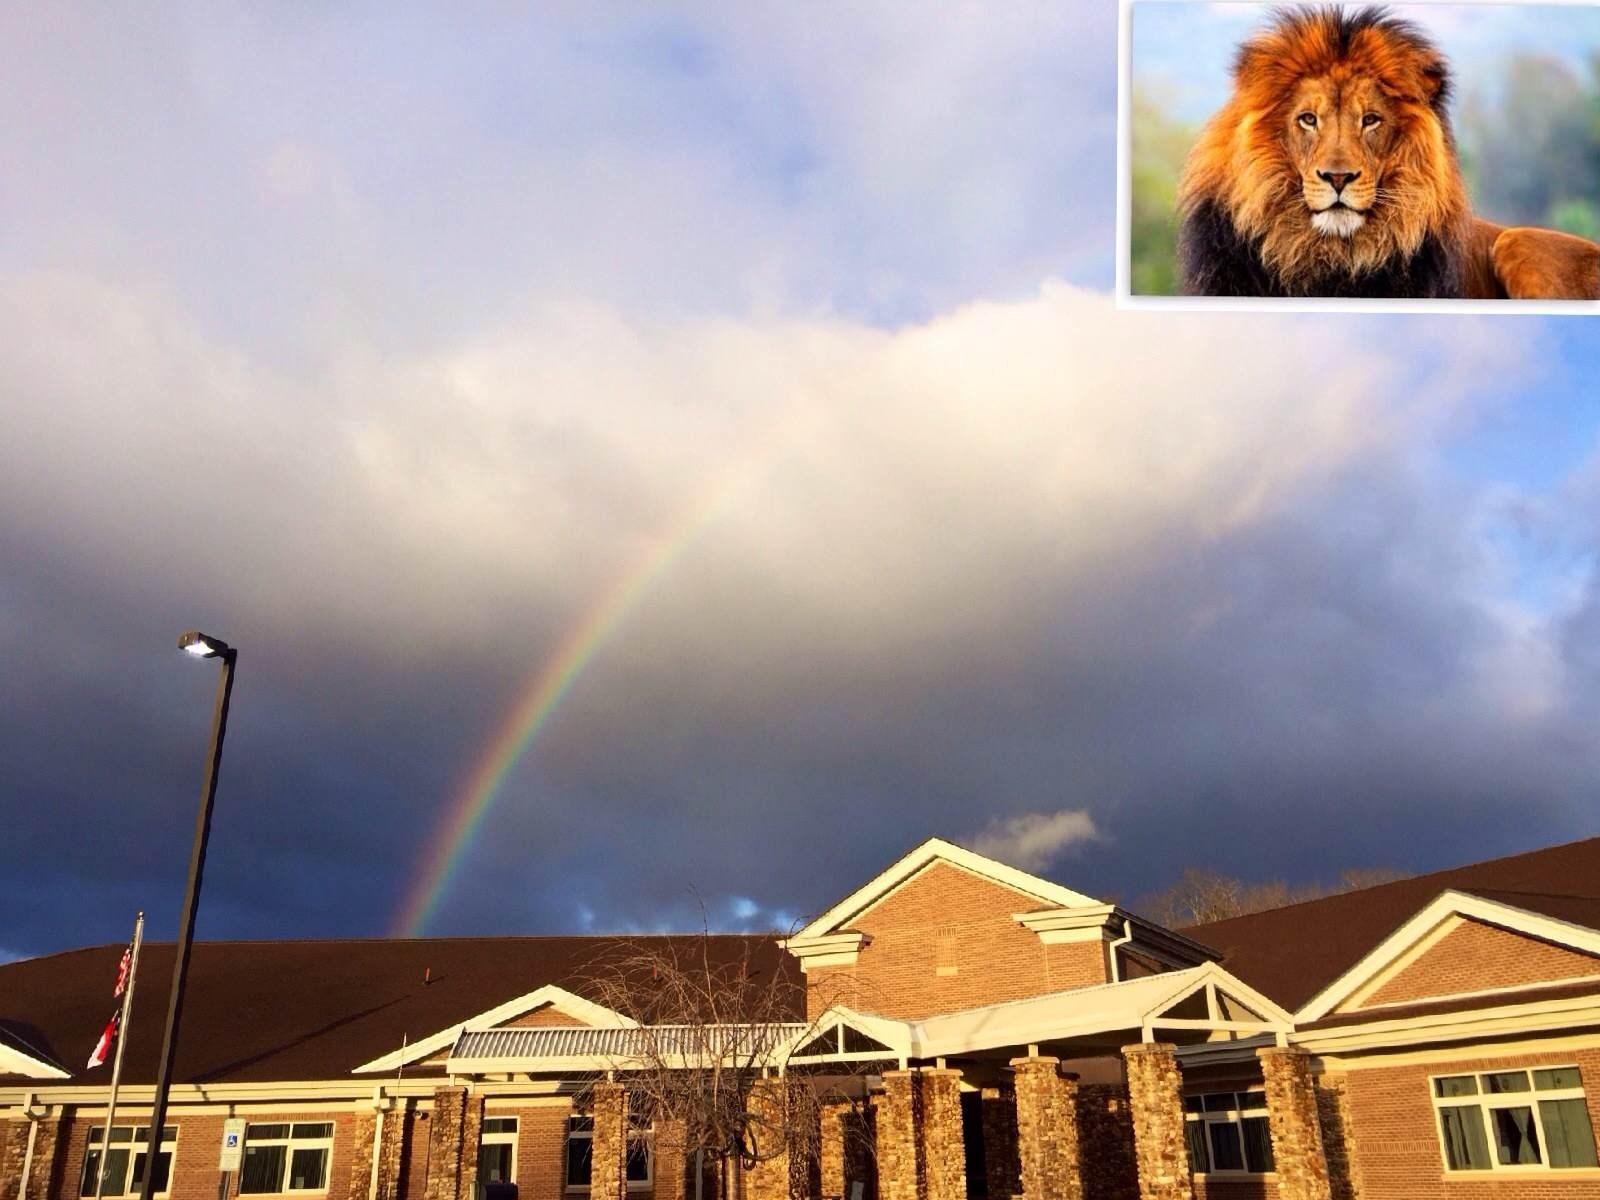 Rainbow shinning over the school